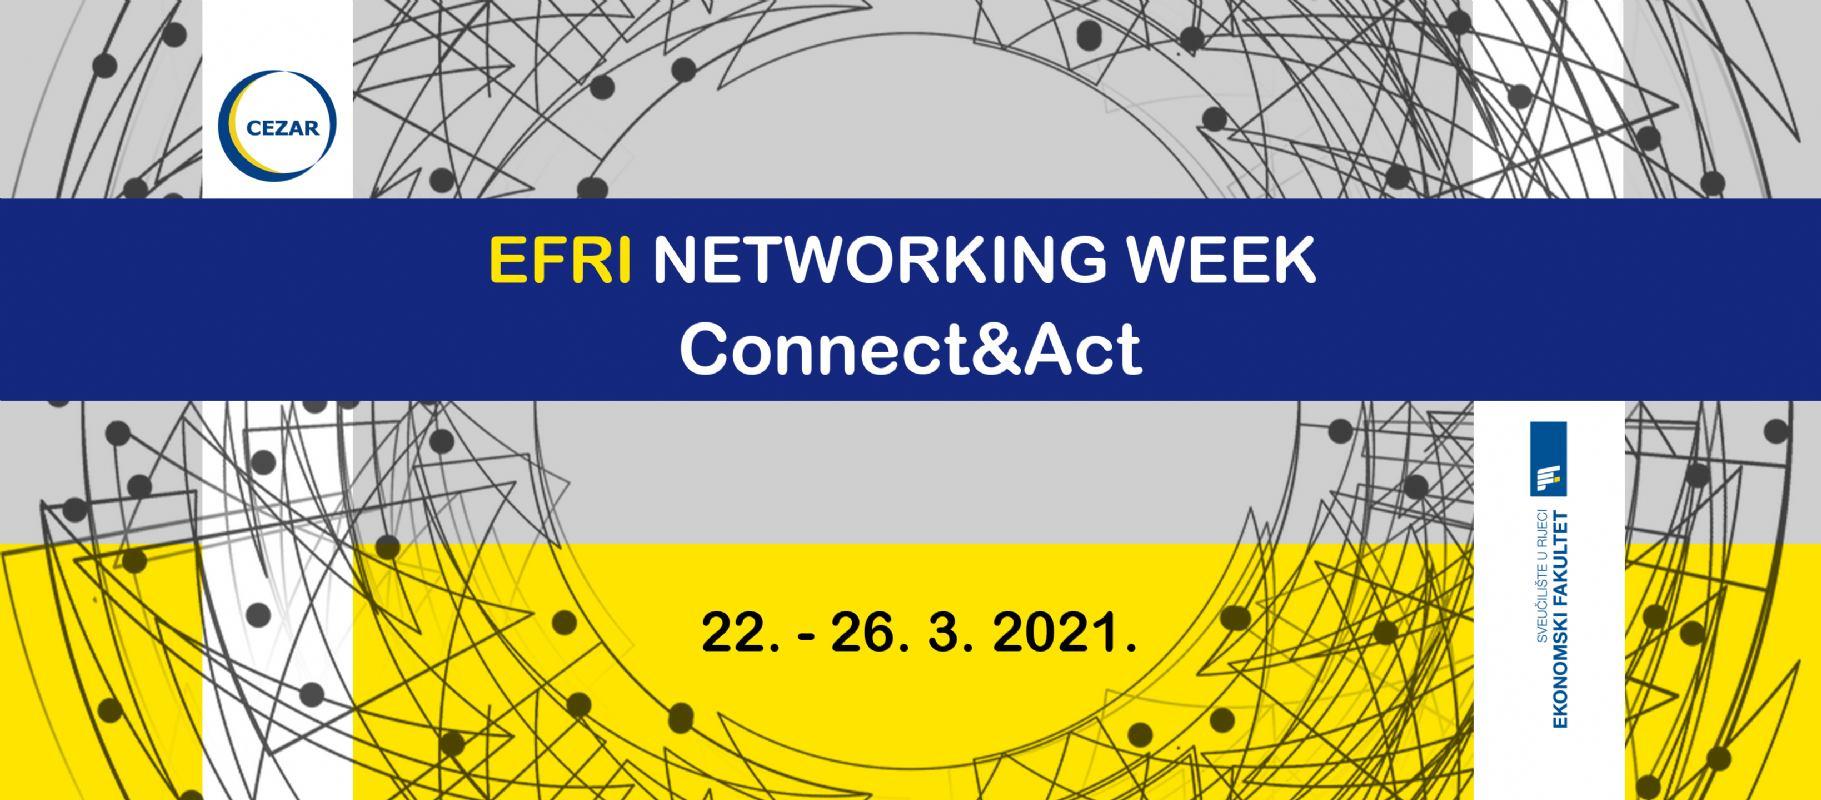 EFRI Networking Week - Connect&Act 22.-26. ožujka 2021.